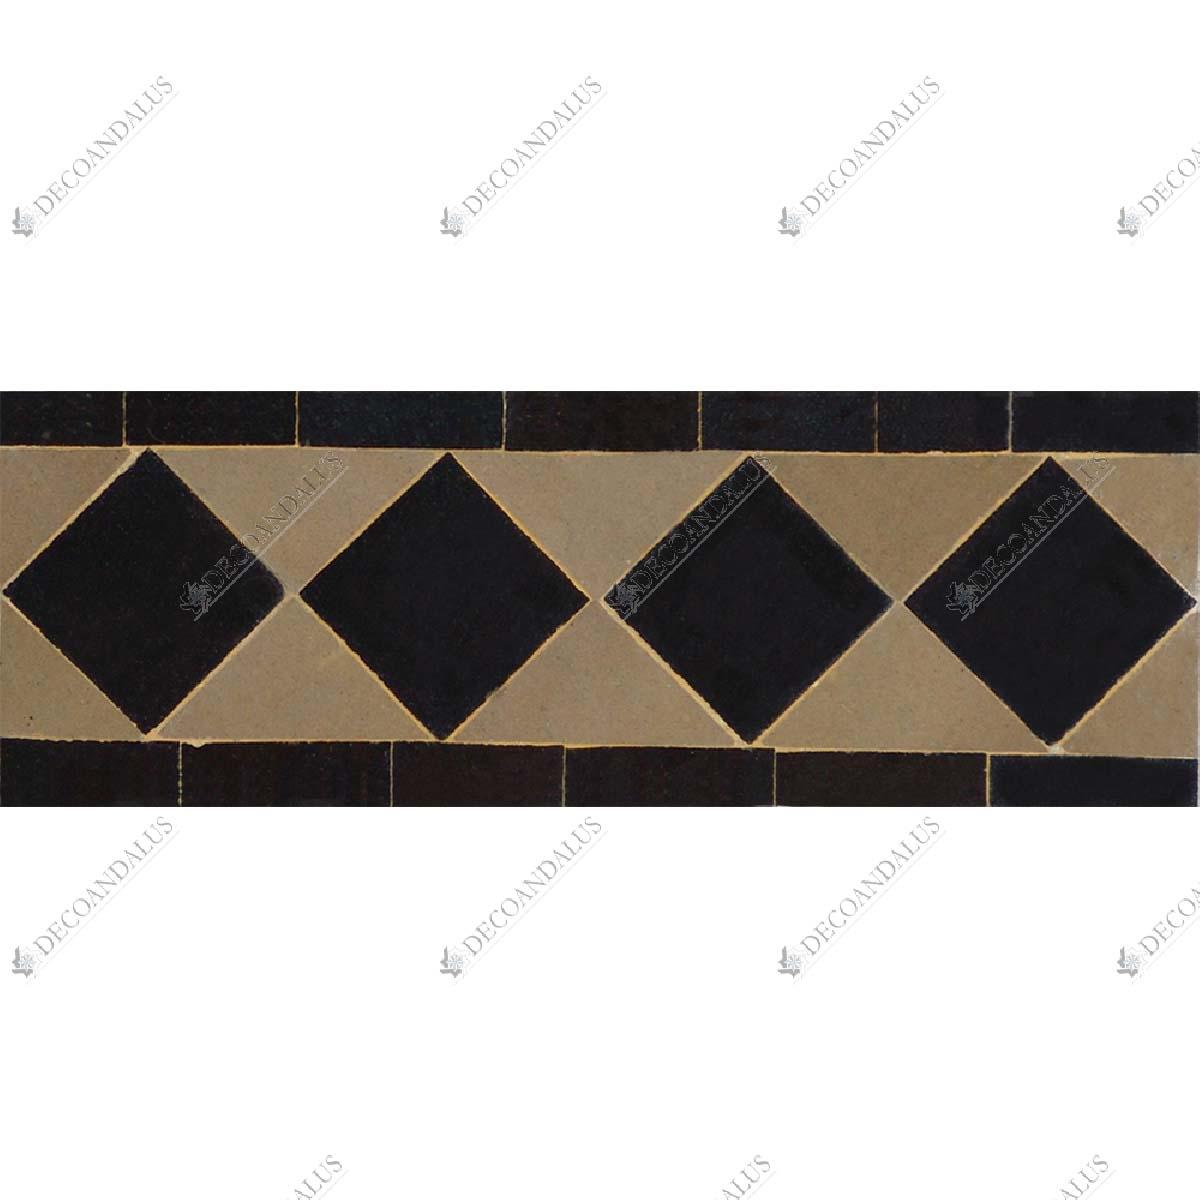 cenefa rabe hecha a mano revestimientos cer micos dise o geom trico. Black Bedroom Furniture Sets. Home Design Ideas